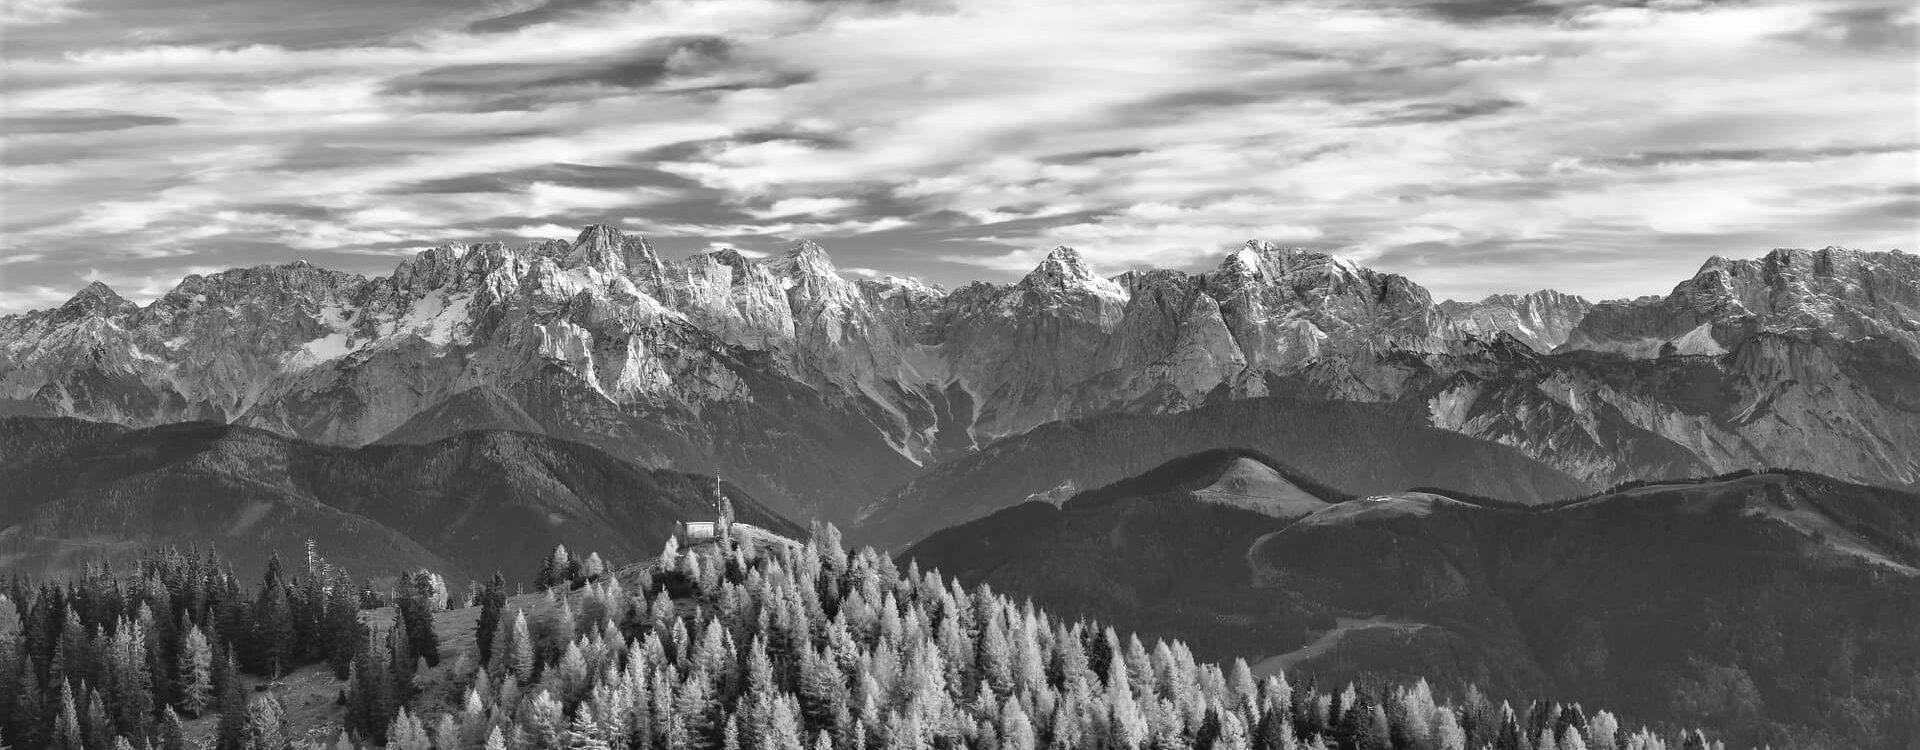 mountain_rokmele_video_compressed